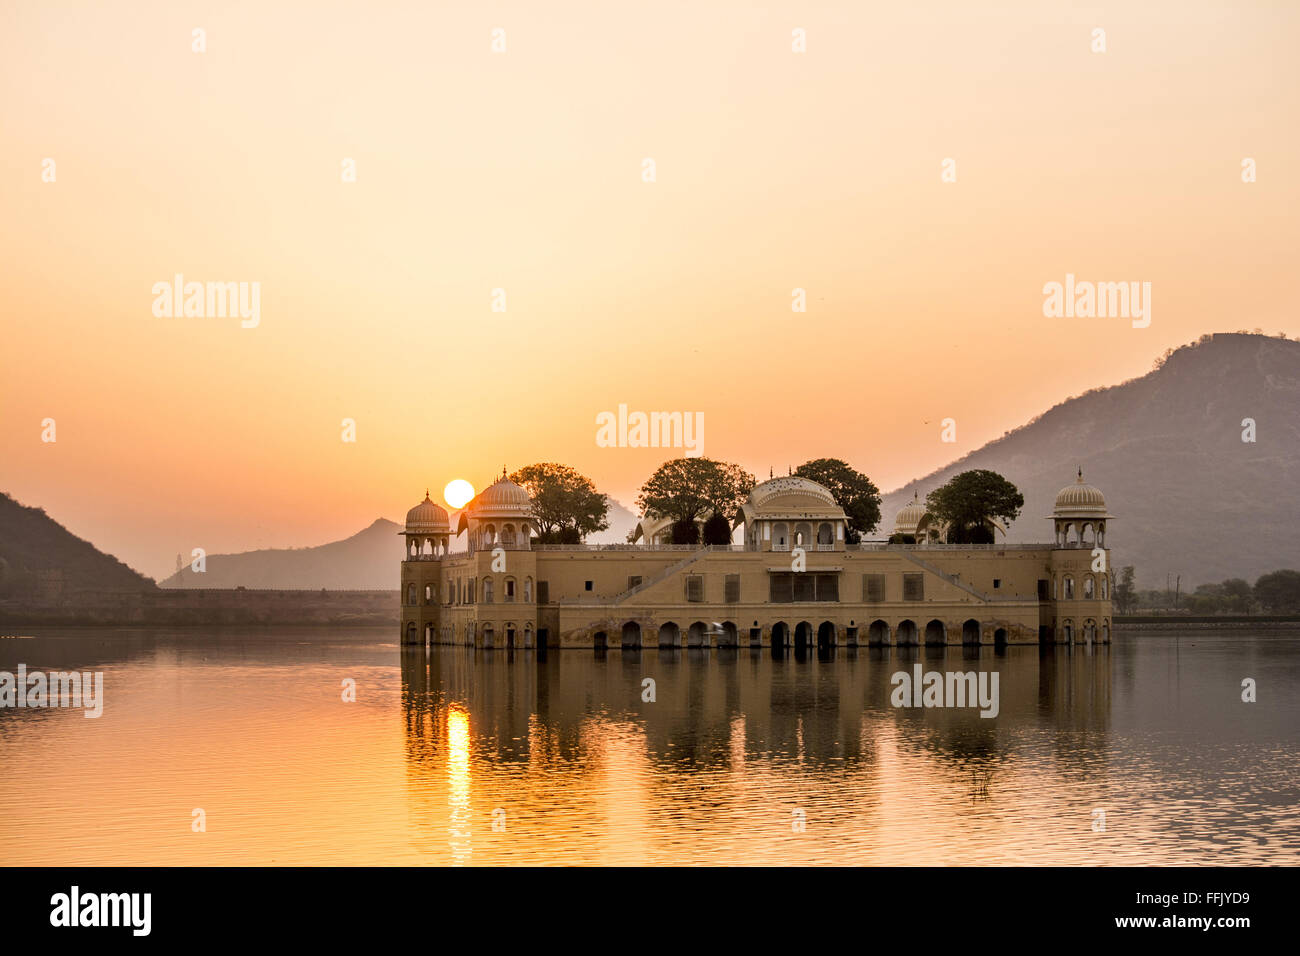 Jai Mahal in the morning. - Stock Image